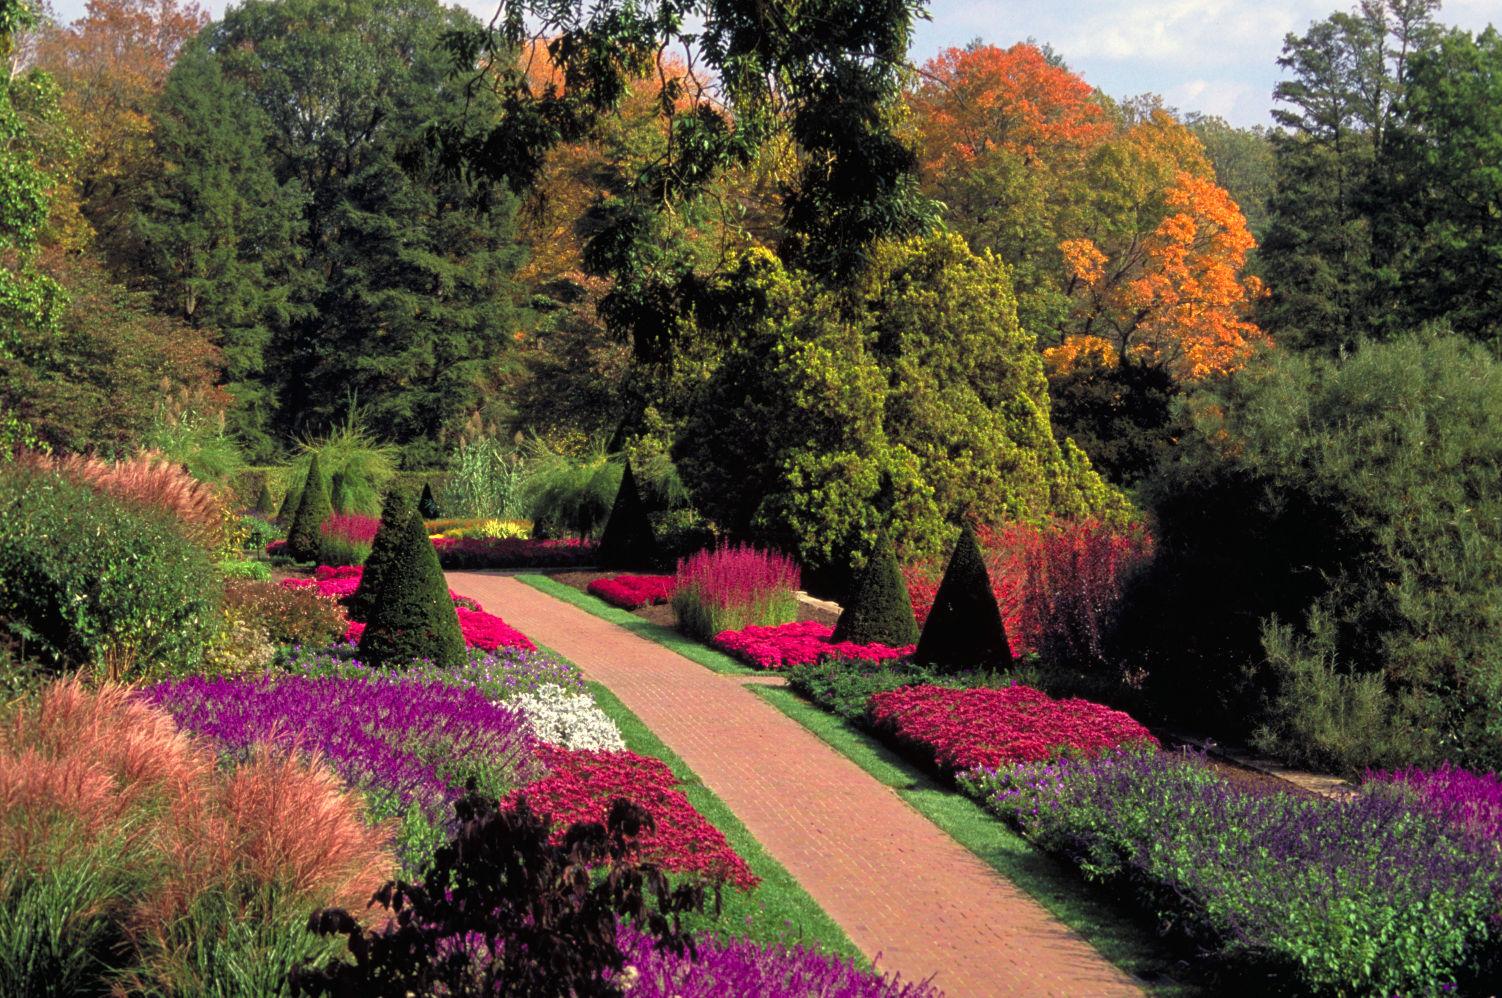 Delicieux Pennsylvania Garden Tops 10 Best Botanical Gardens List | Home + Garden |  Lancasteronline.com